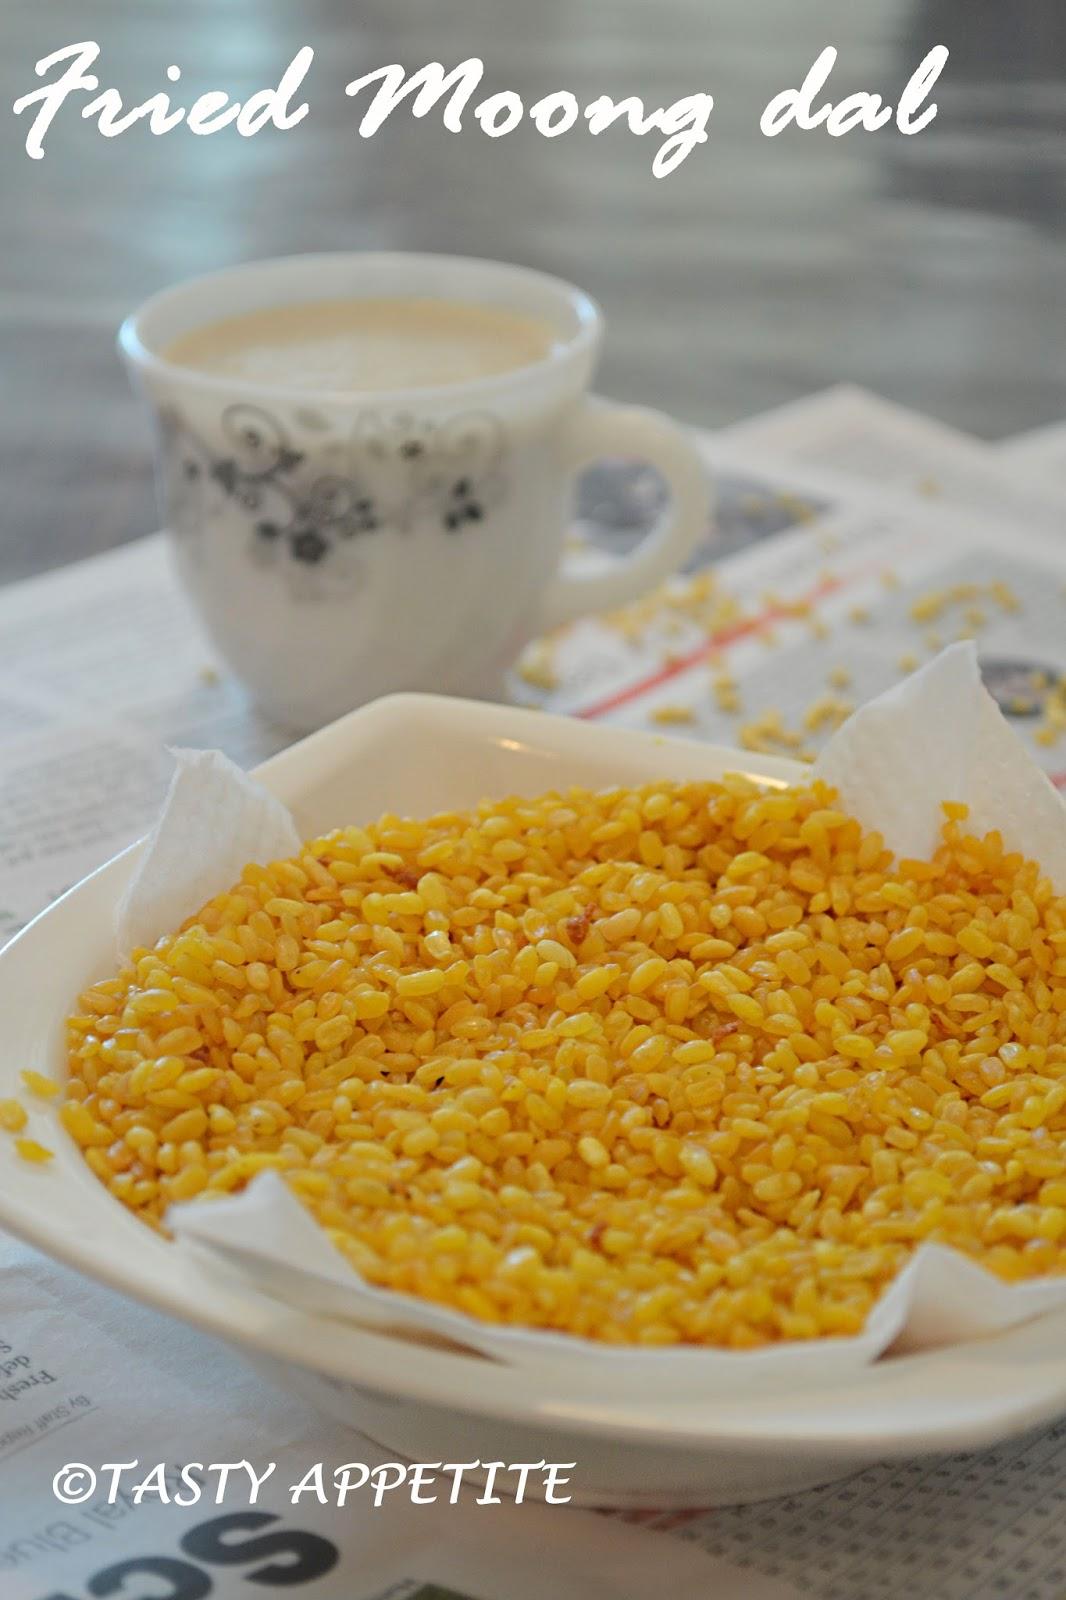 Fried Moong Dal Haldiram Style Namkeen Fried Crispy Moong Dal Recipe Easy Snacks Recipes